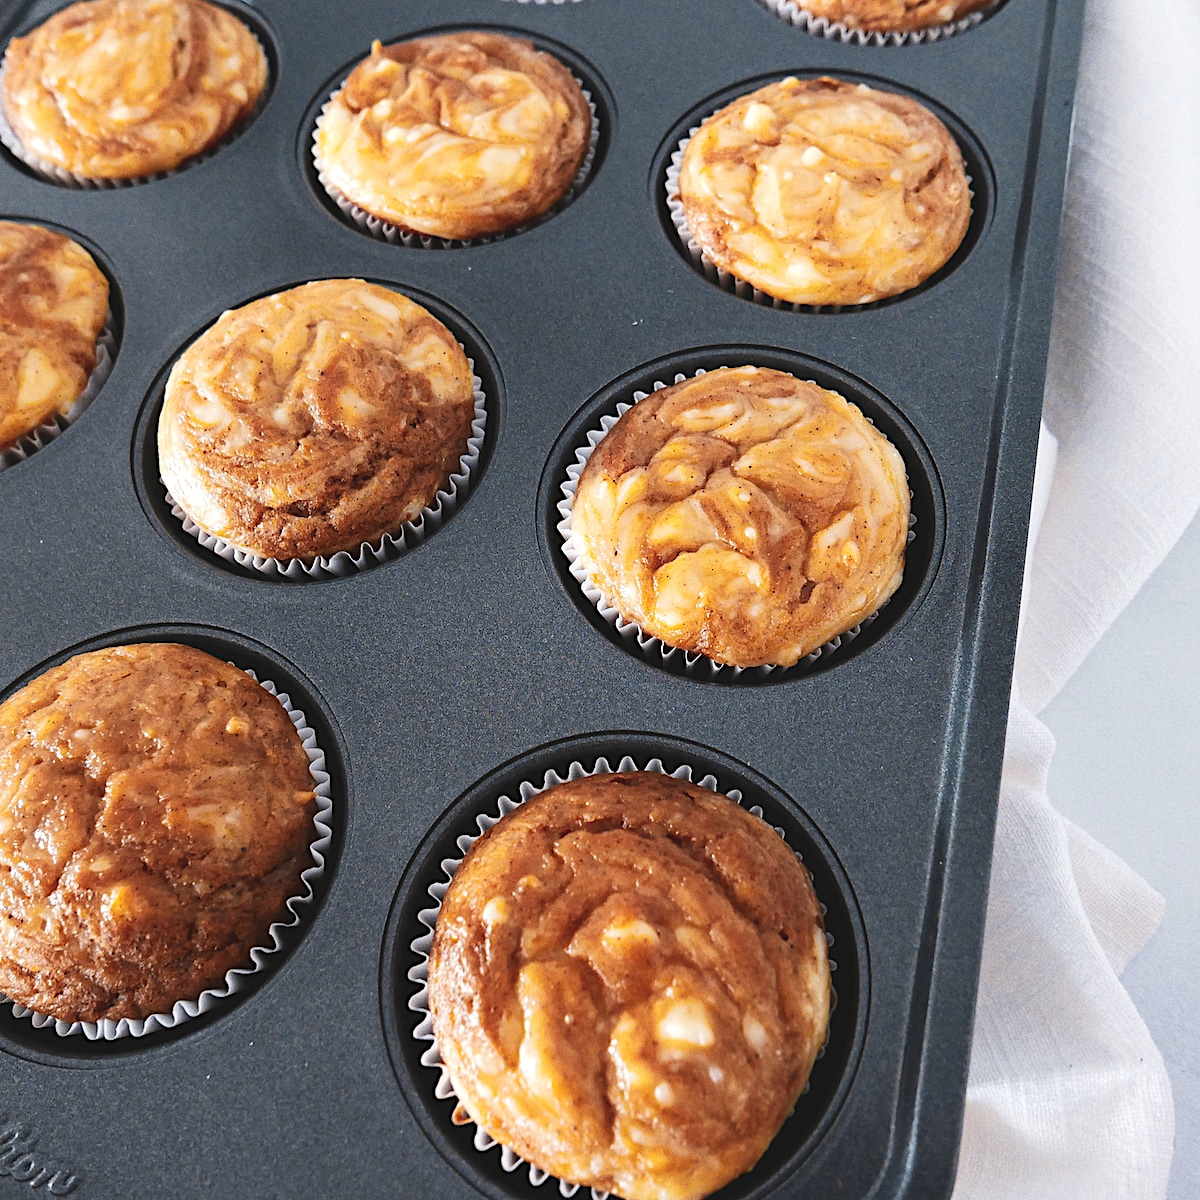 pumpkin cream cheese swirl muffins in baking tin with white dish towel